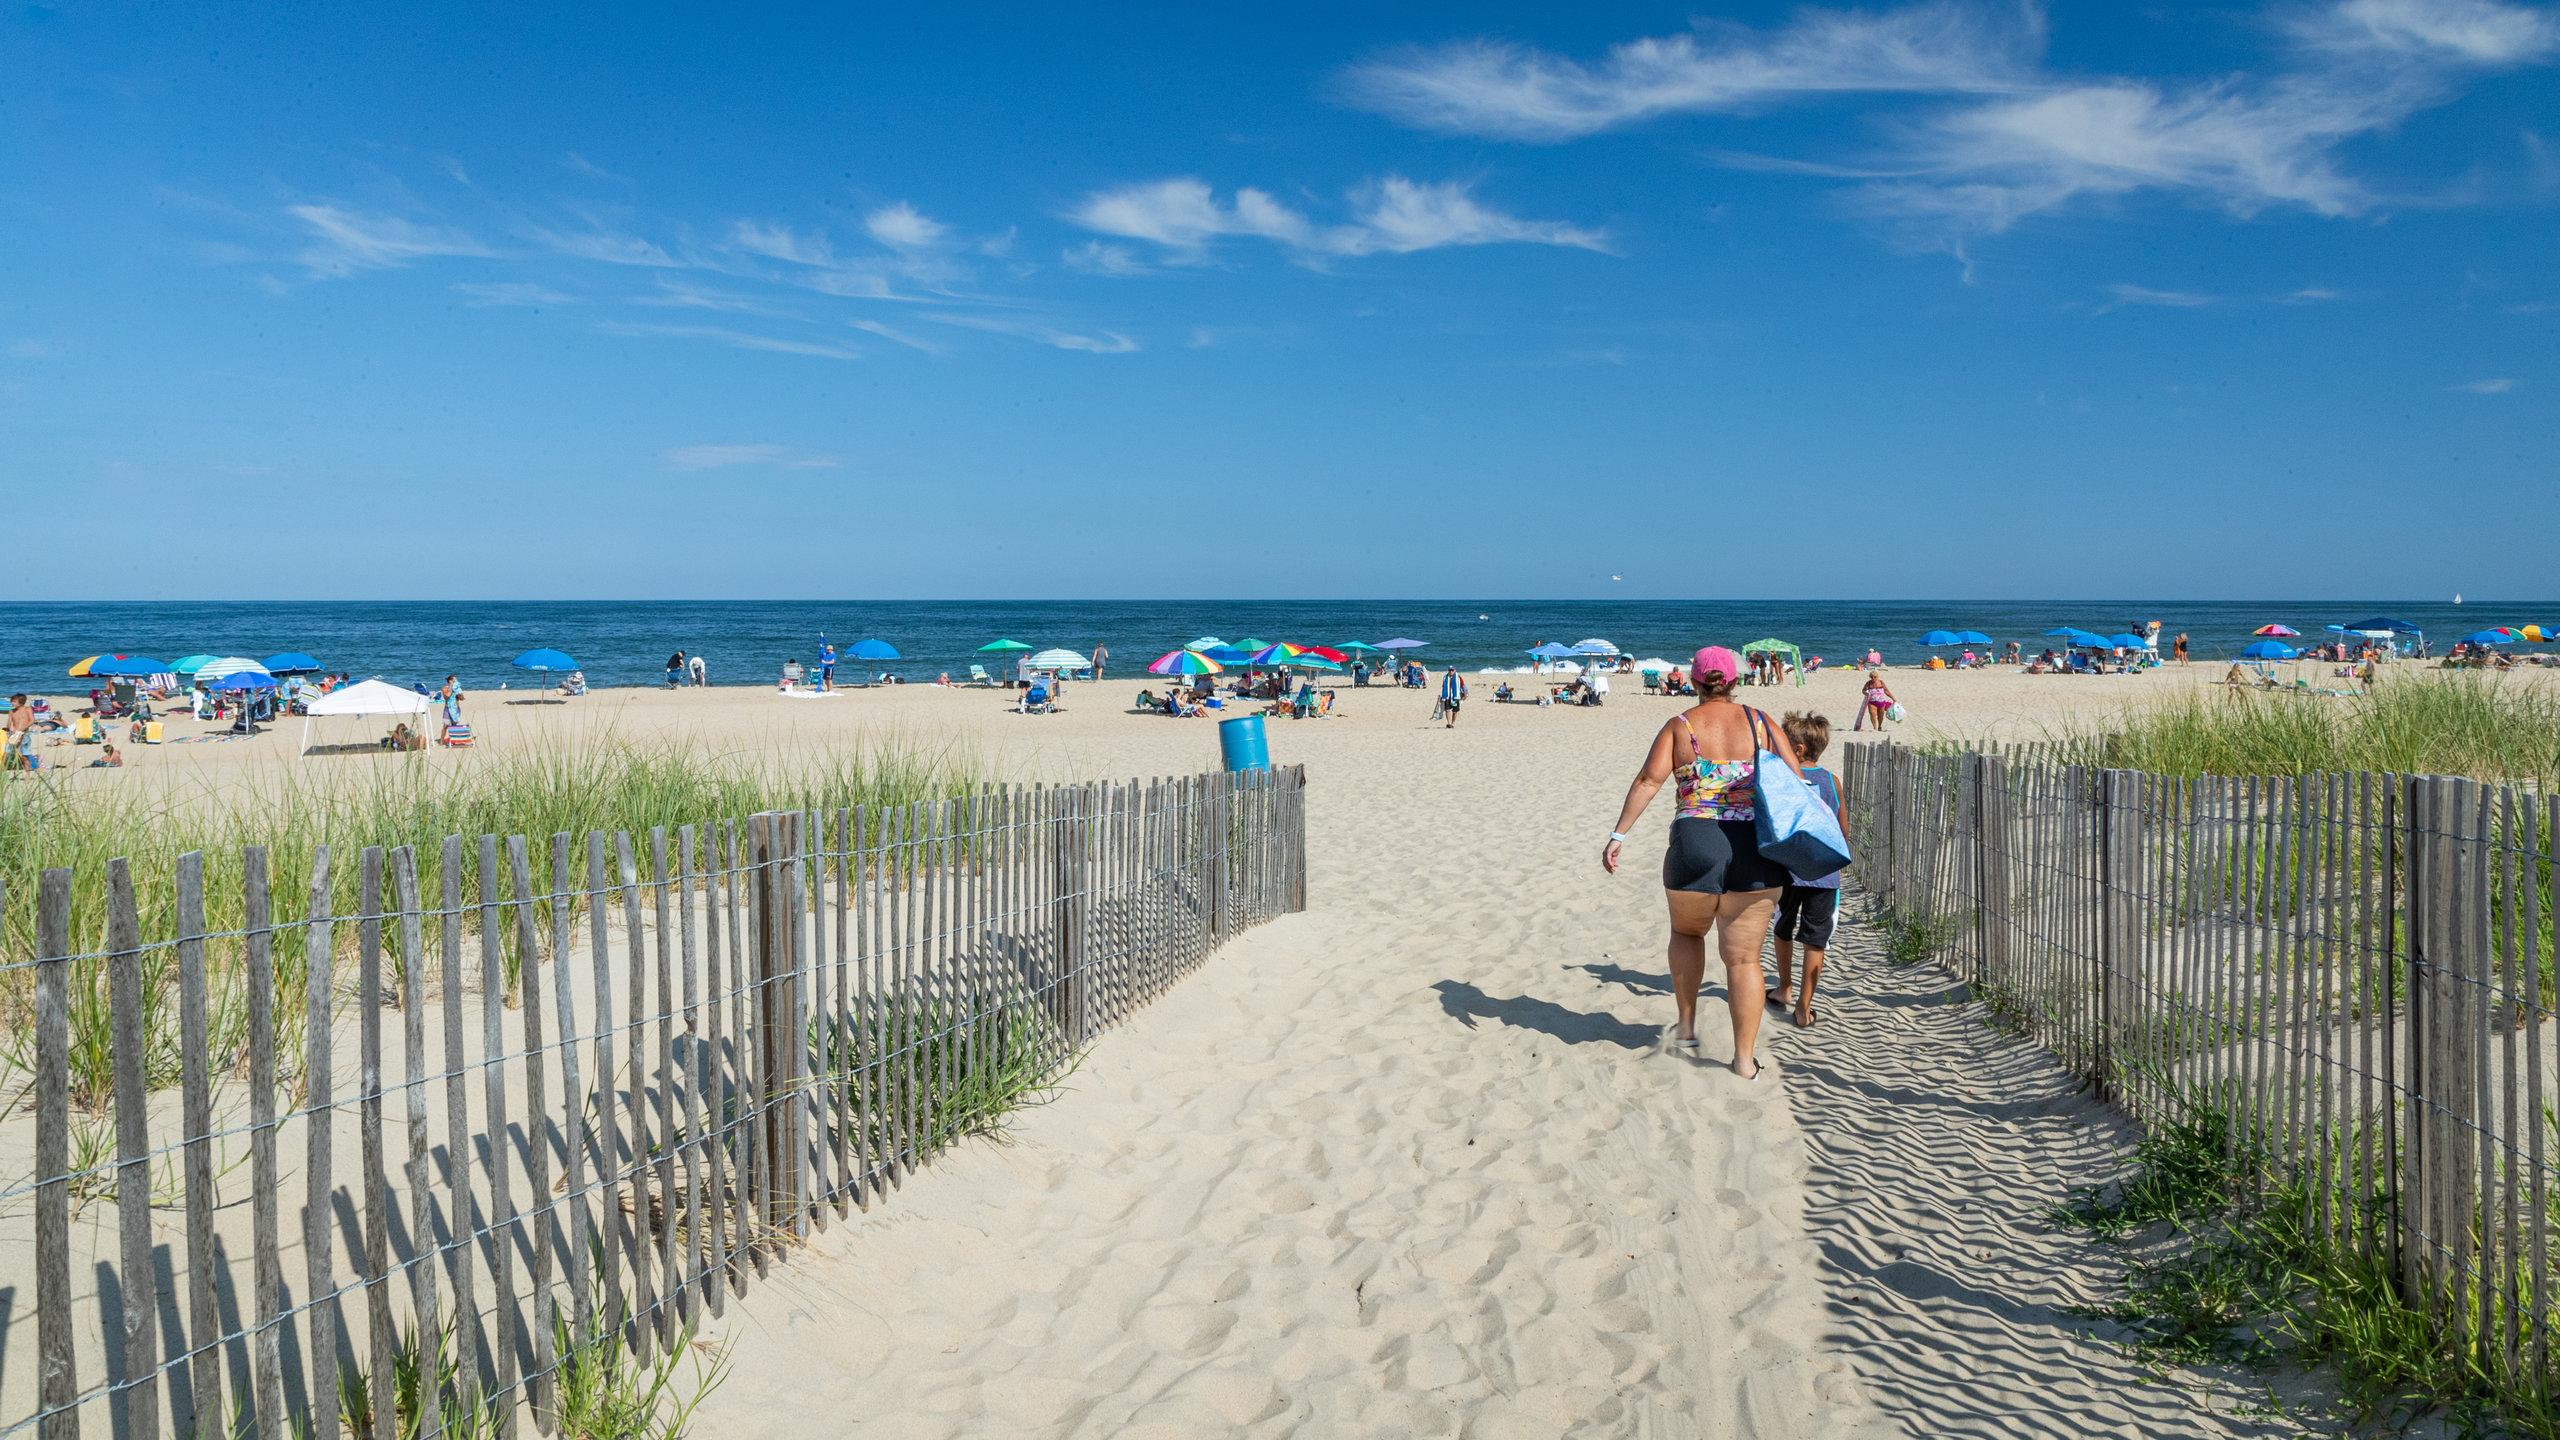 Maryland Beach, Ocean City, Maryland, United States of America